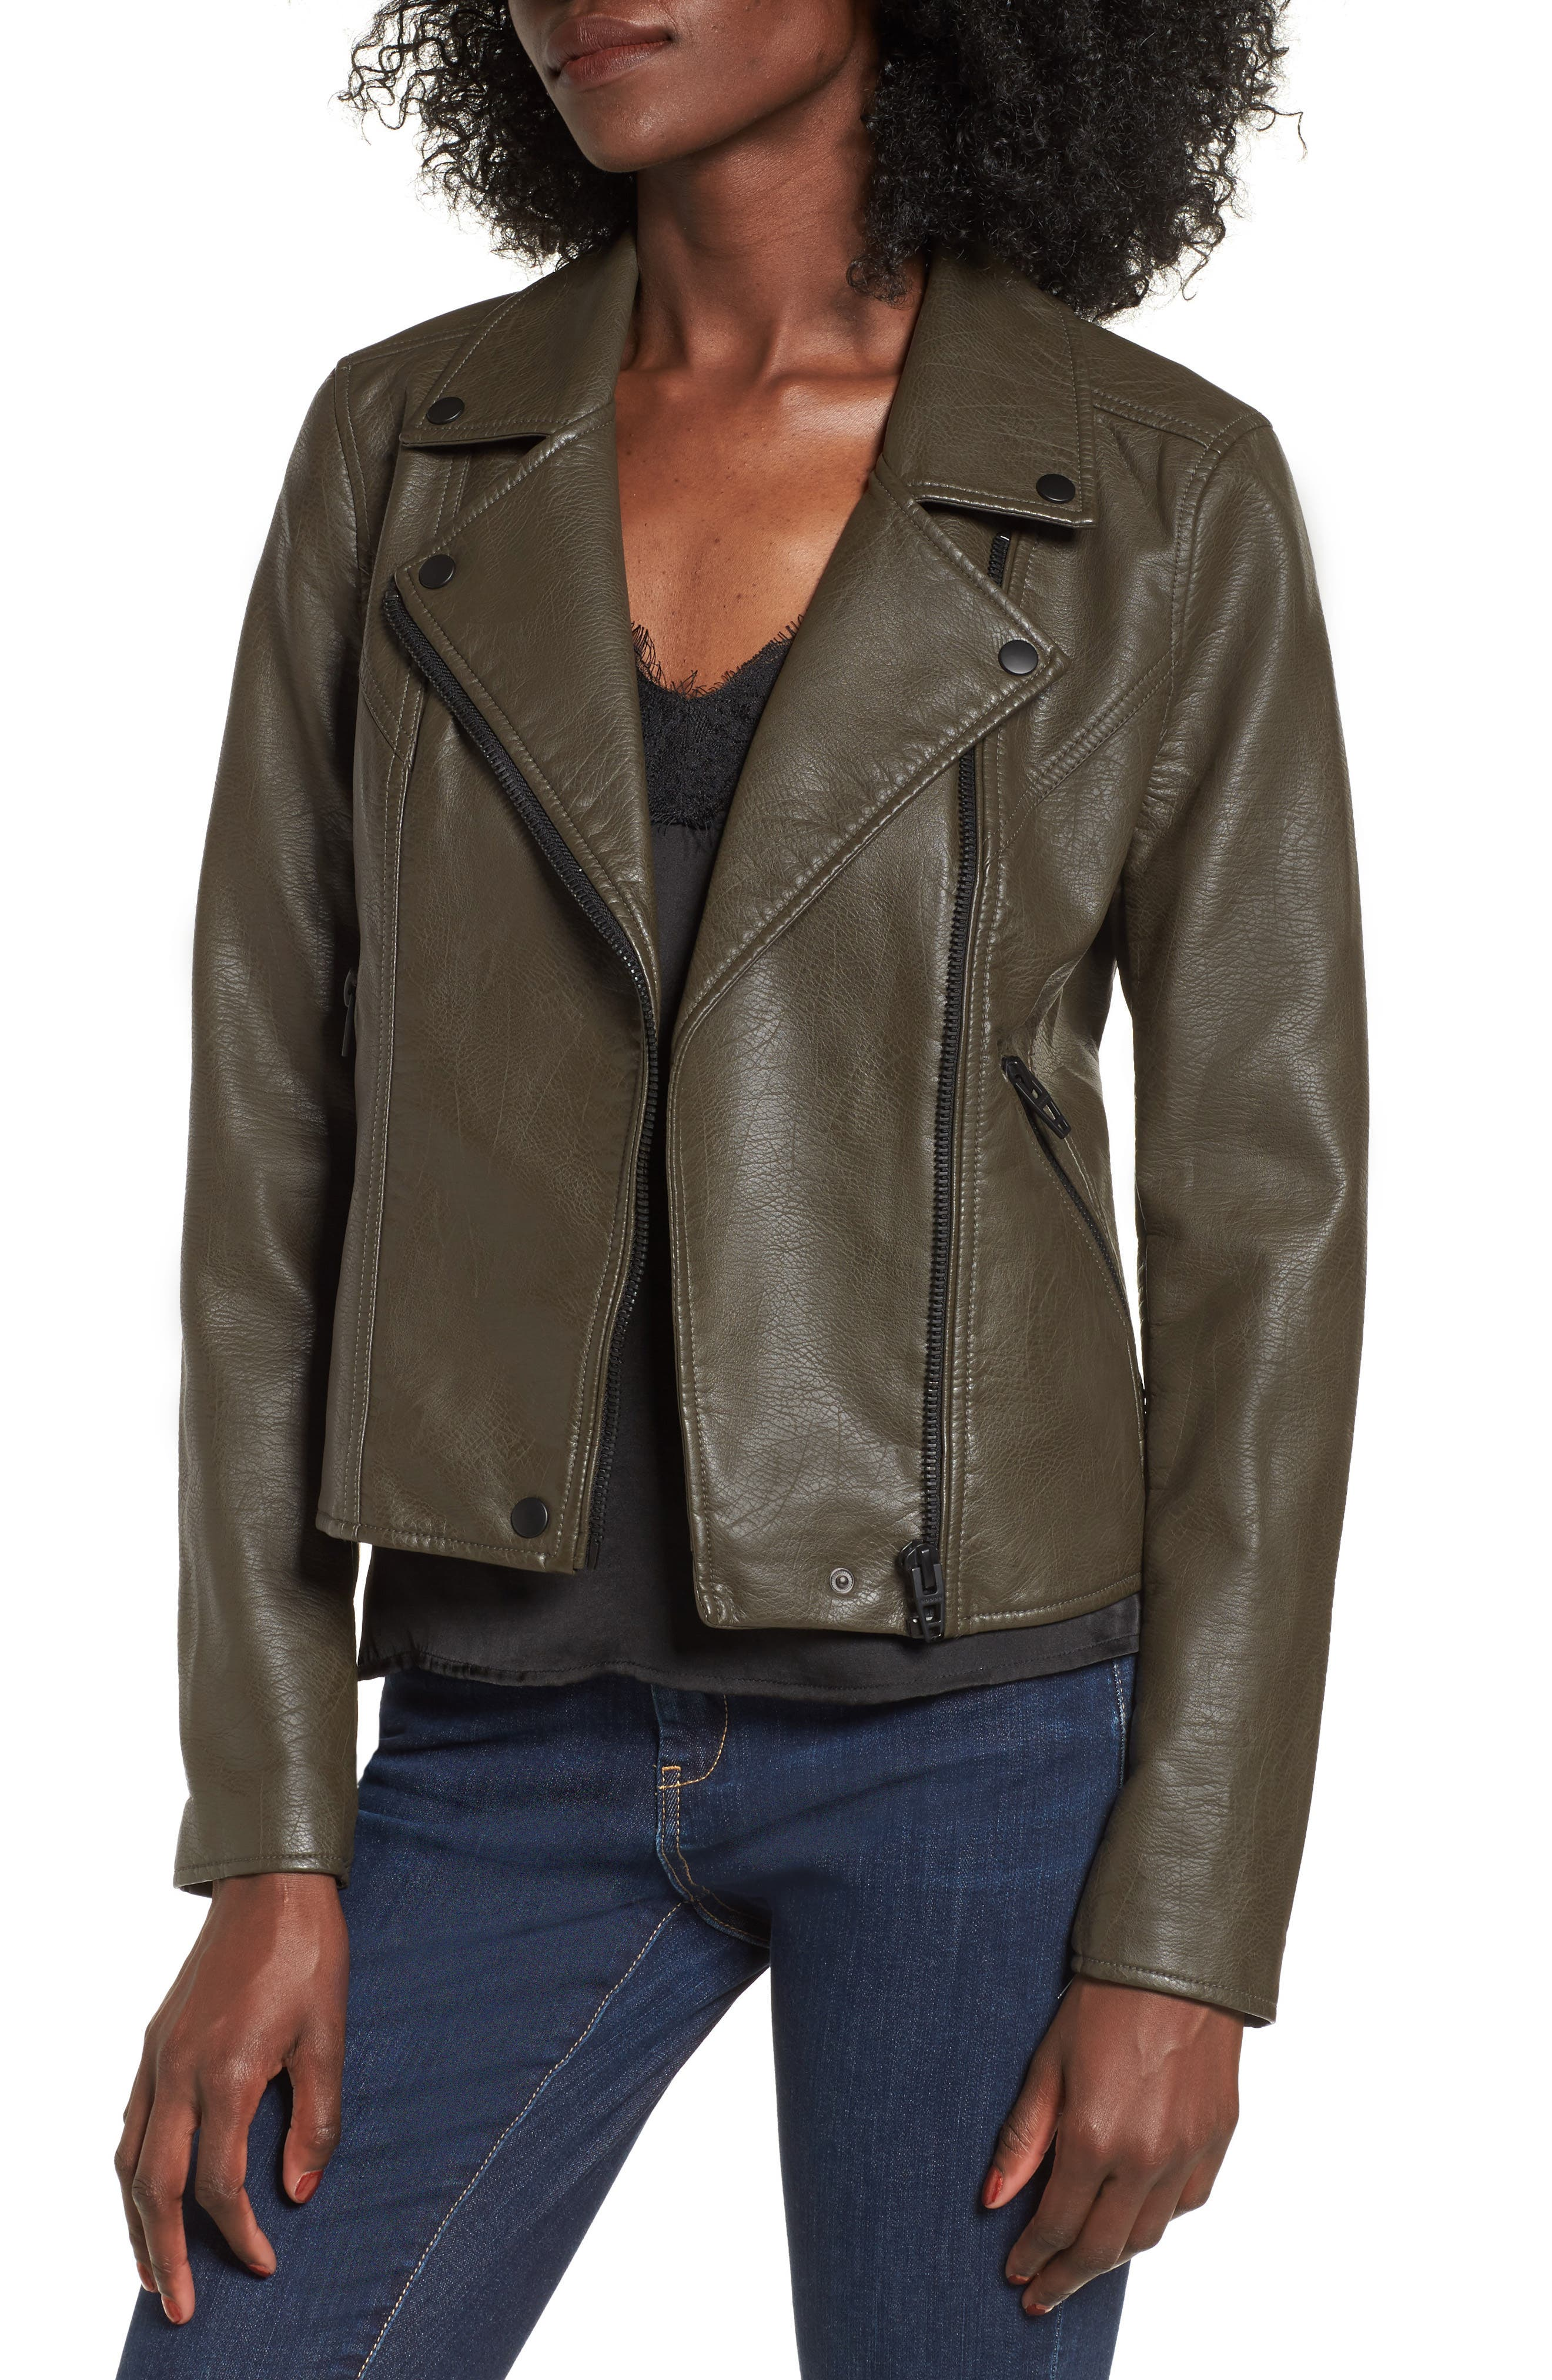 Leather jacket repair vancouver - Leather Jacket Repair Vancouver 44